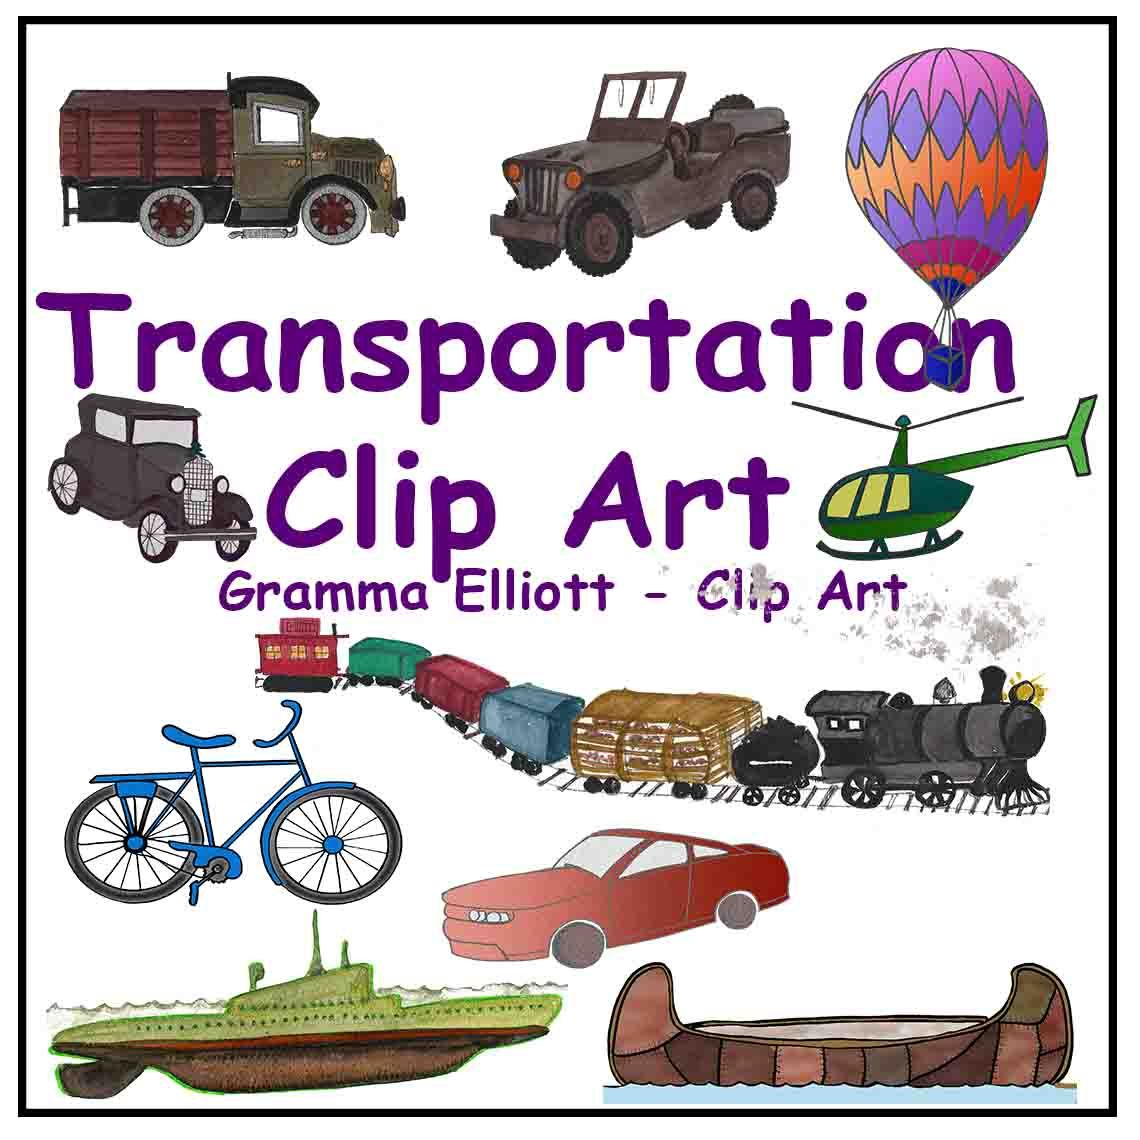 Clip art train boat. Biking clipart transportation